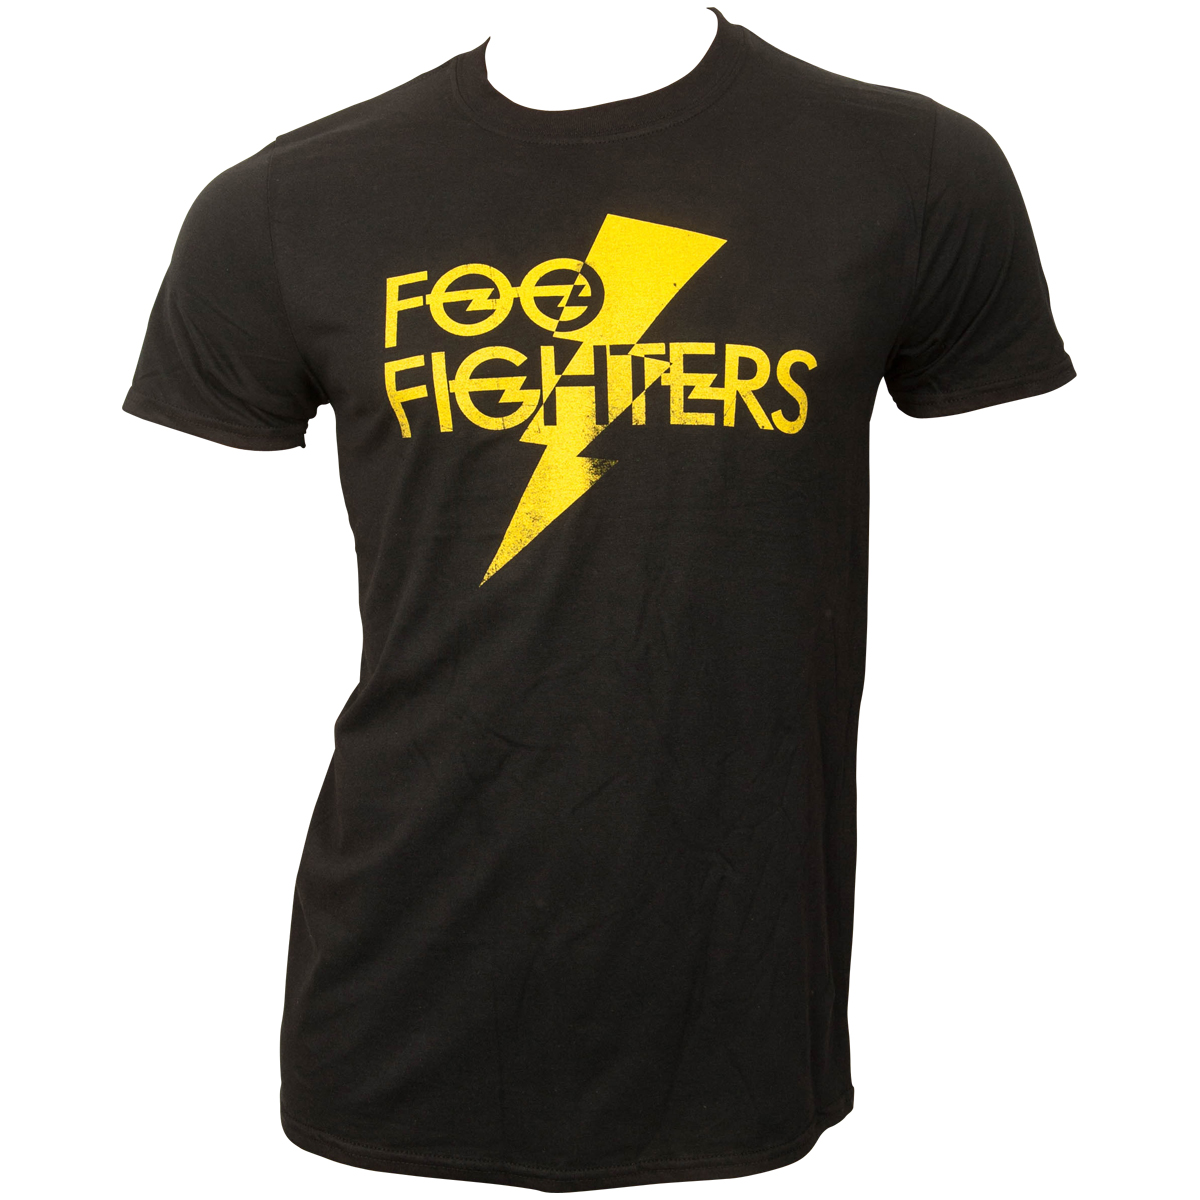 Foo Fighters - T-Shirt Lightning Strike - schwarz